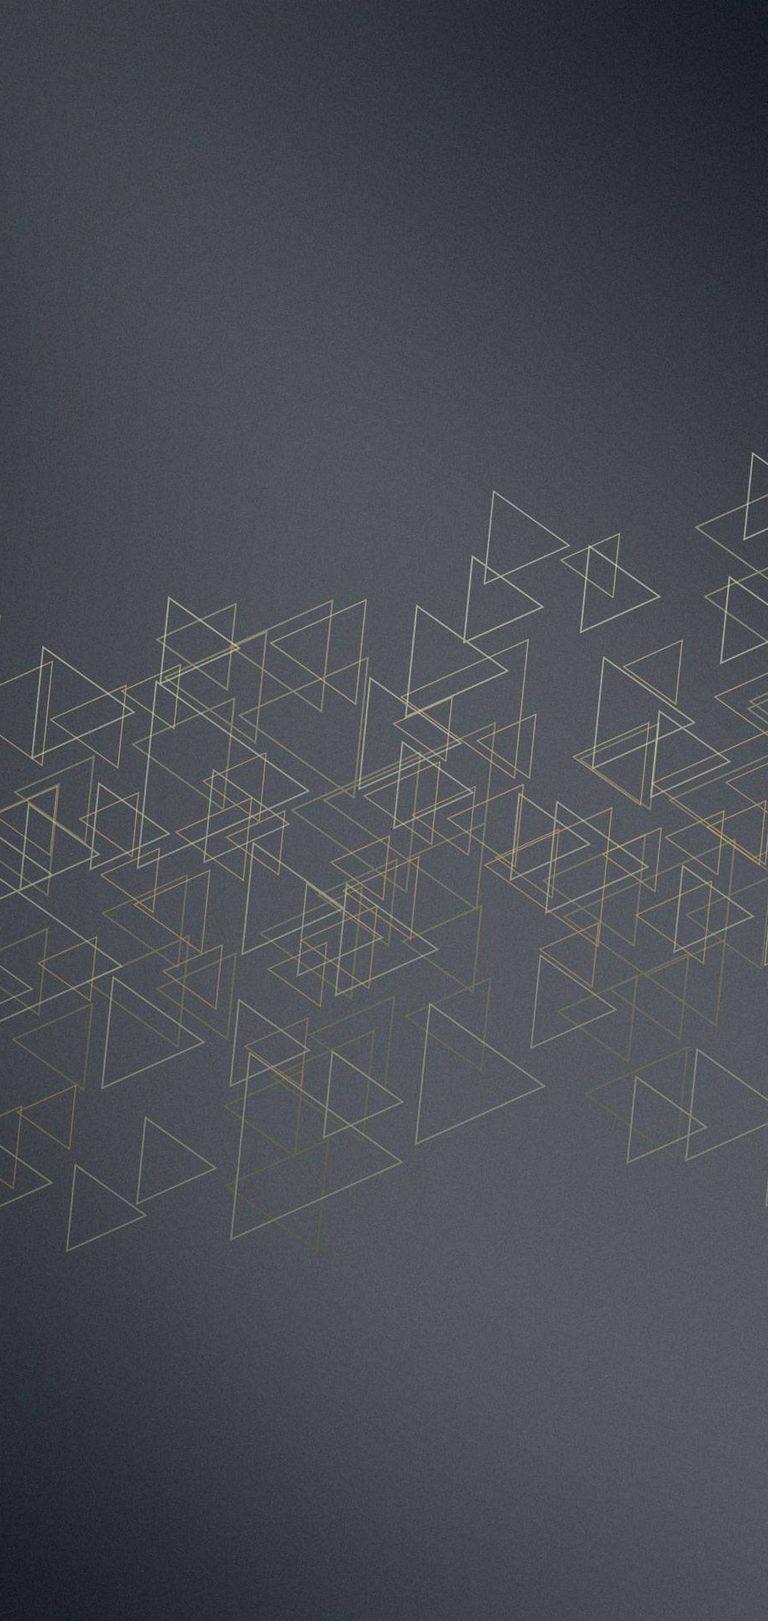 Triangles Icon Texture Wallpaper 1440x3040 768x1621